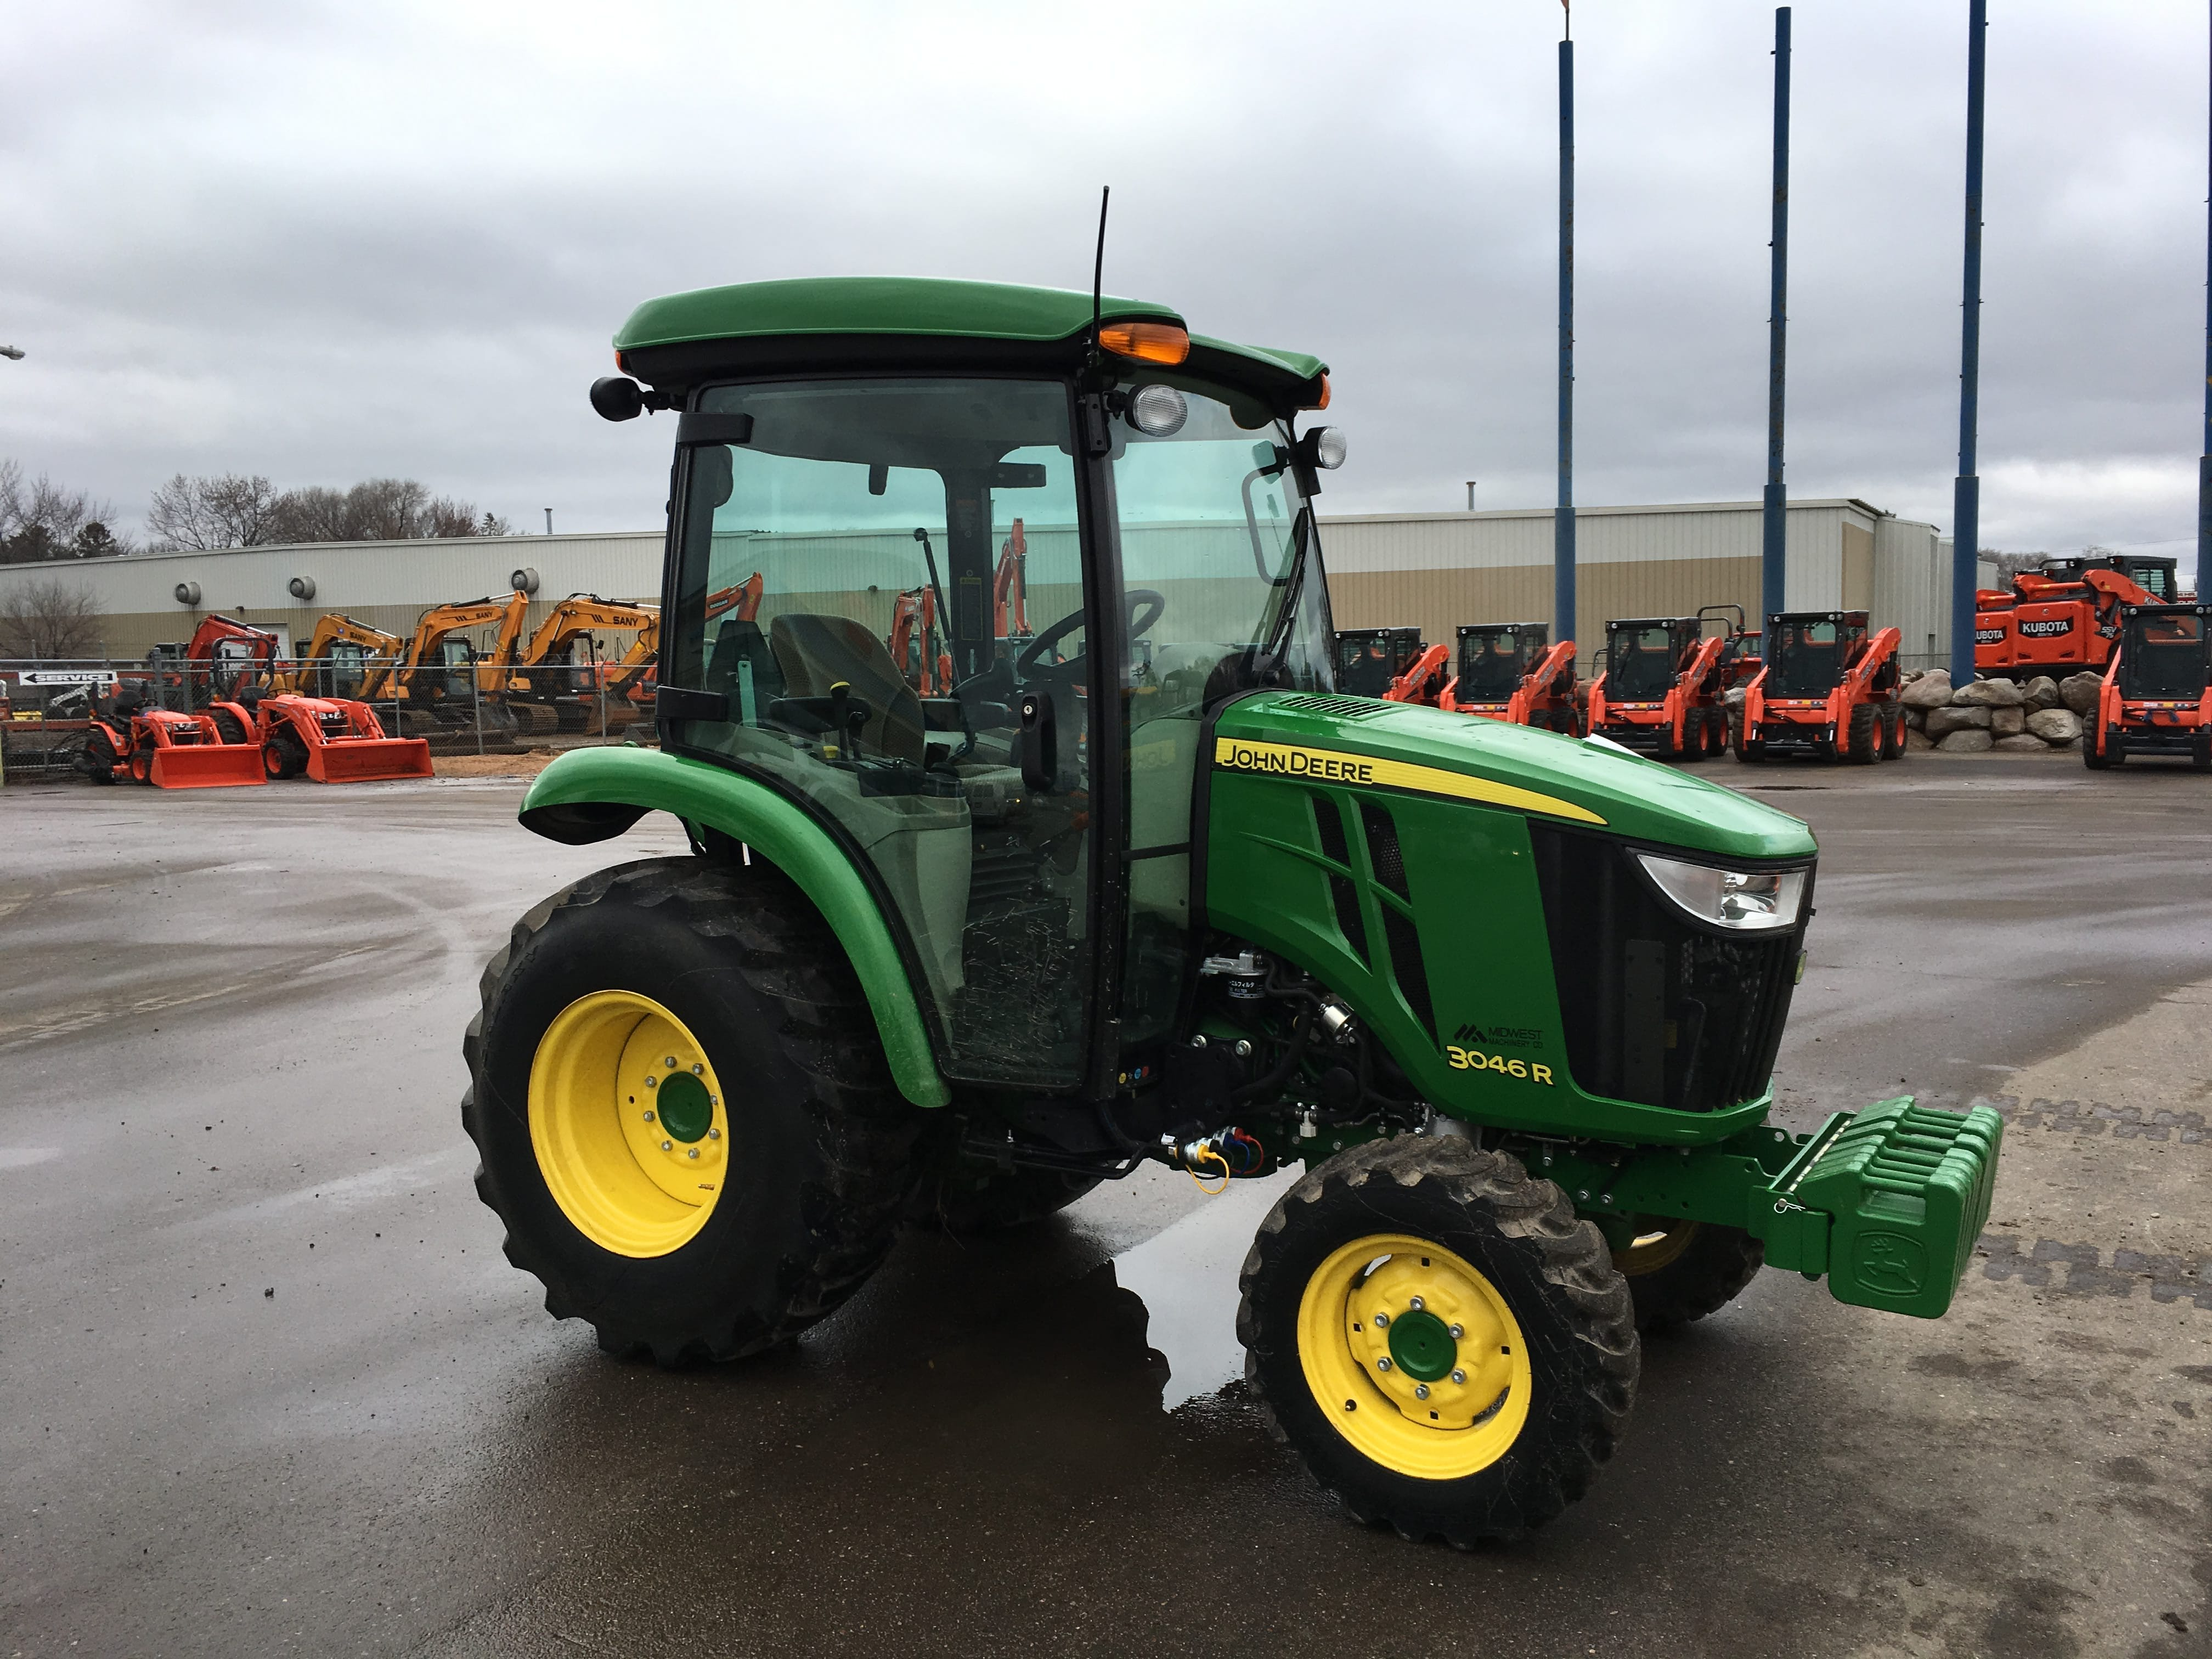 2015 John Deere 3046R Compact Tractor - Lano Equipment, Inc.